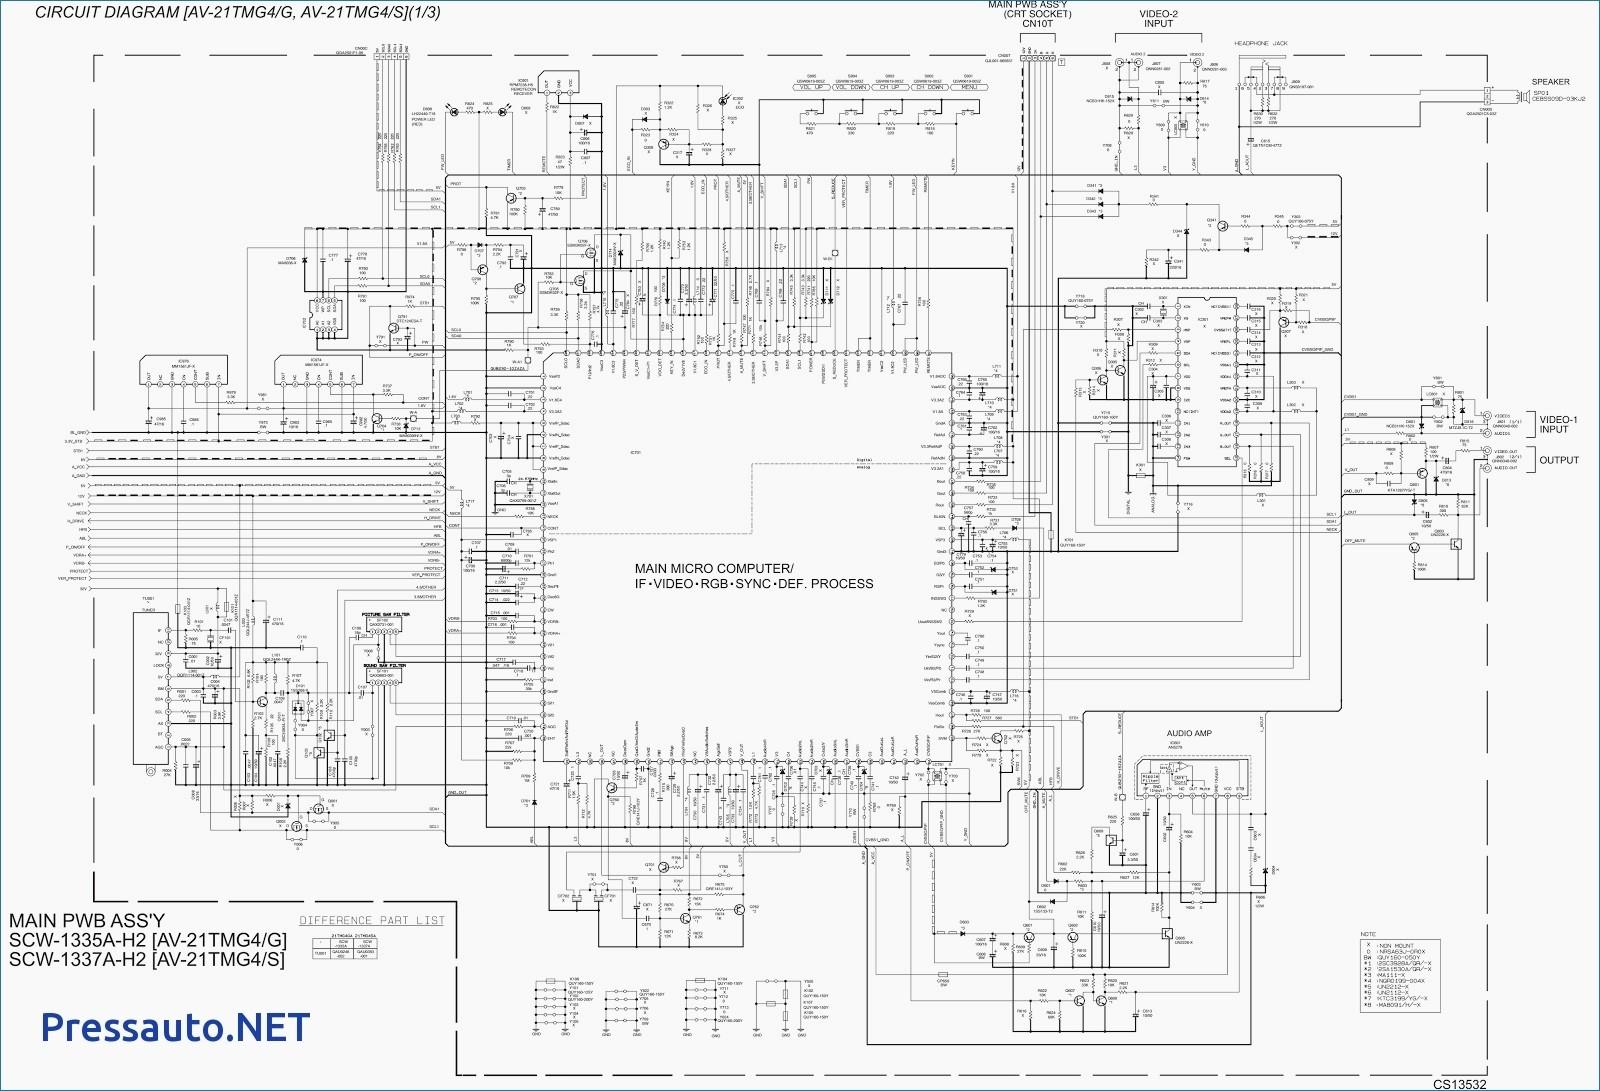 jvc kd r300 wiring diagram daily electronical wiring diagram • jvc kd r300 wiring harness wiring diagrams schematic rh 1 pelzmoden mueller de jvc kd r330 wiring diagram jvc car stereo wiring diagram